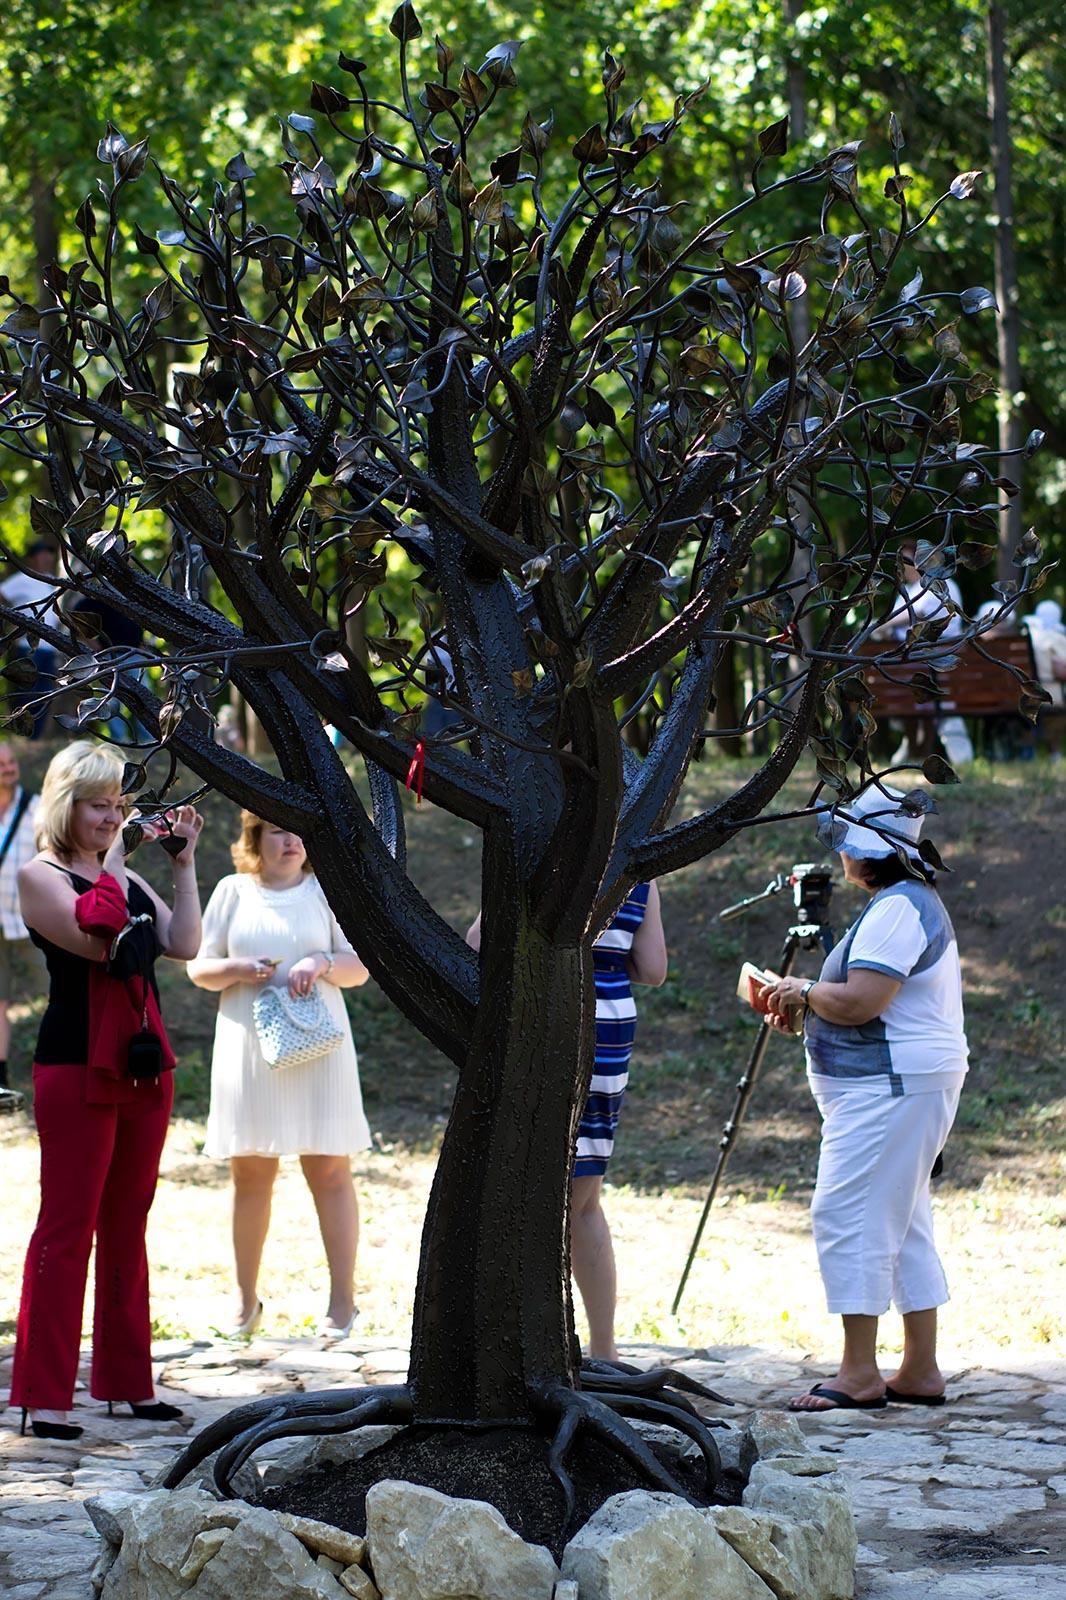 Фото №108775. Дерево потомков. Александровский сад. Елабуга. 3 августа 2012